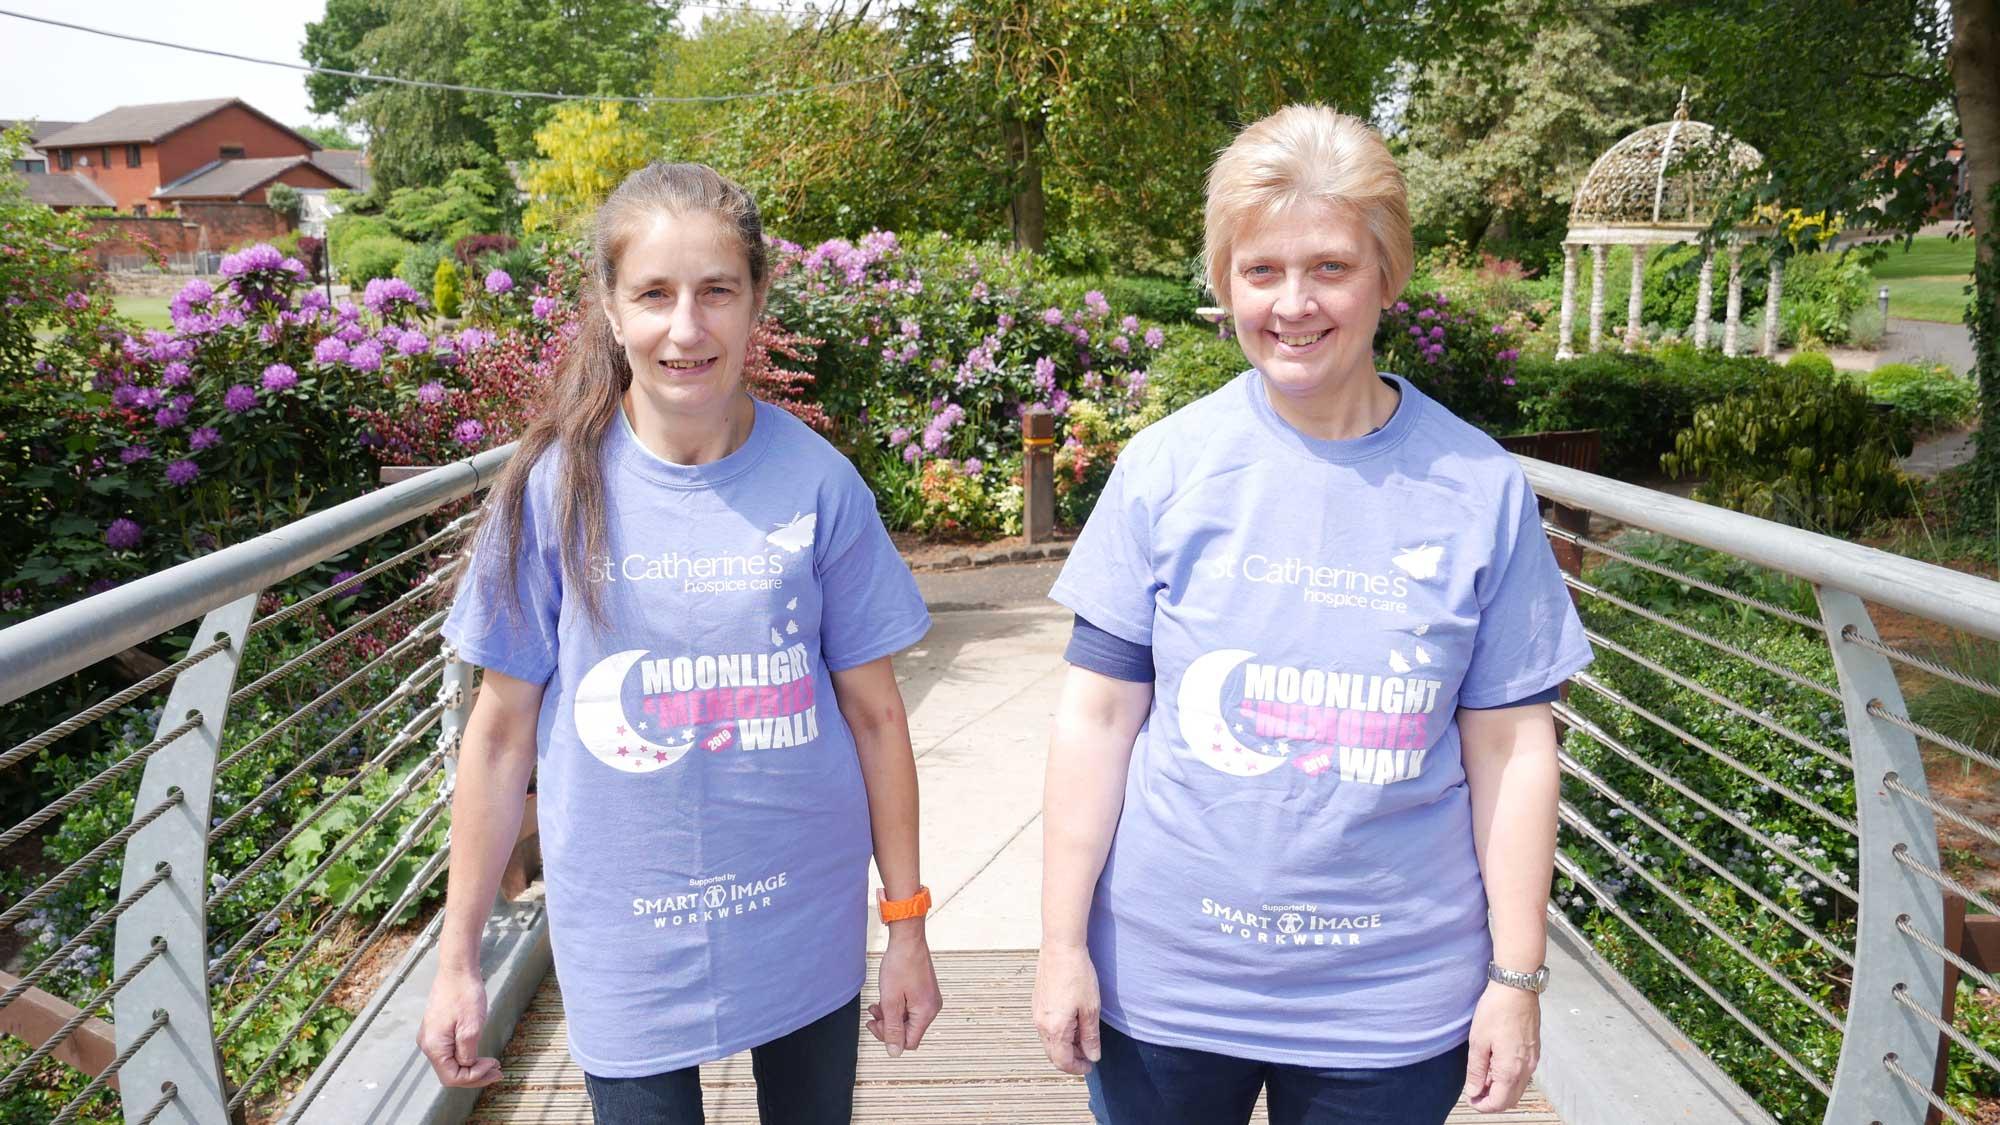 Ellen Whittingham and Louise Houghton